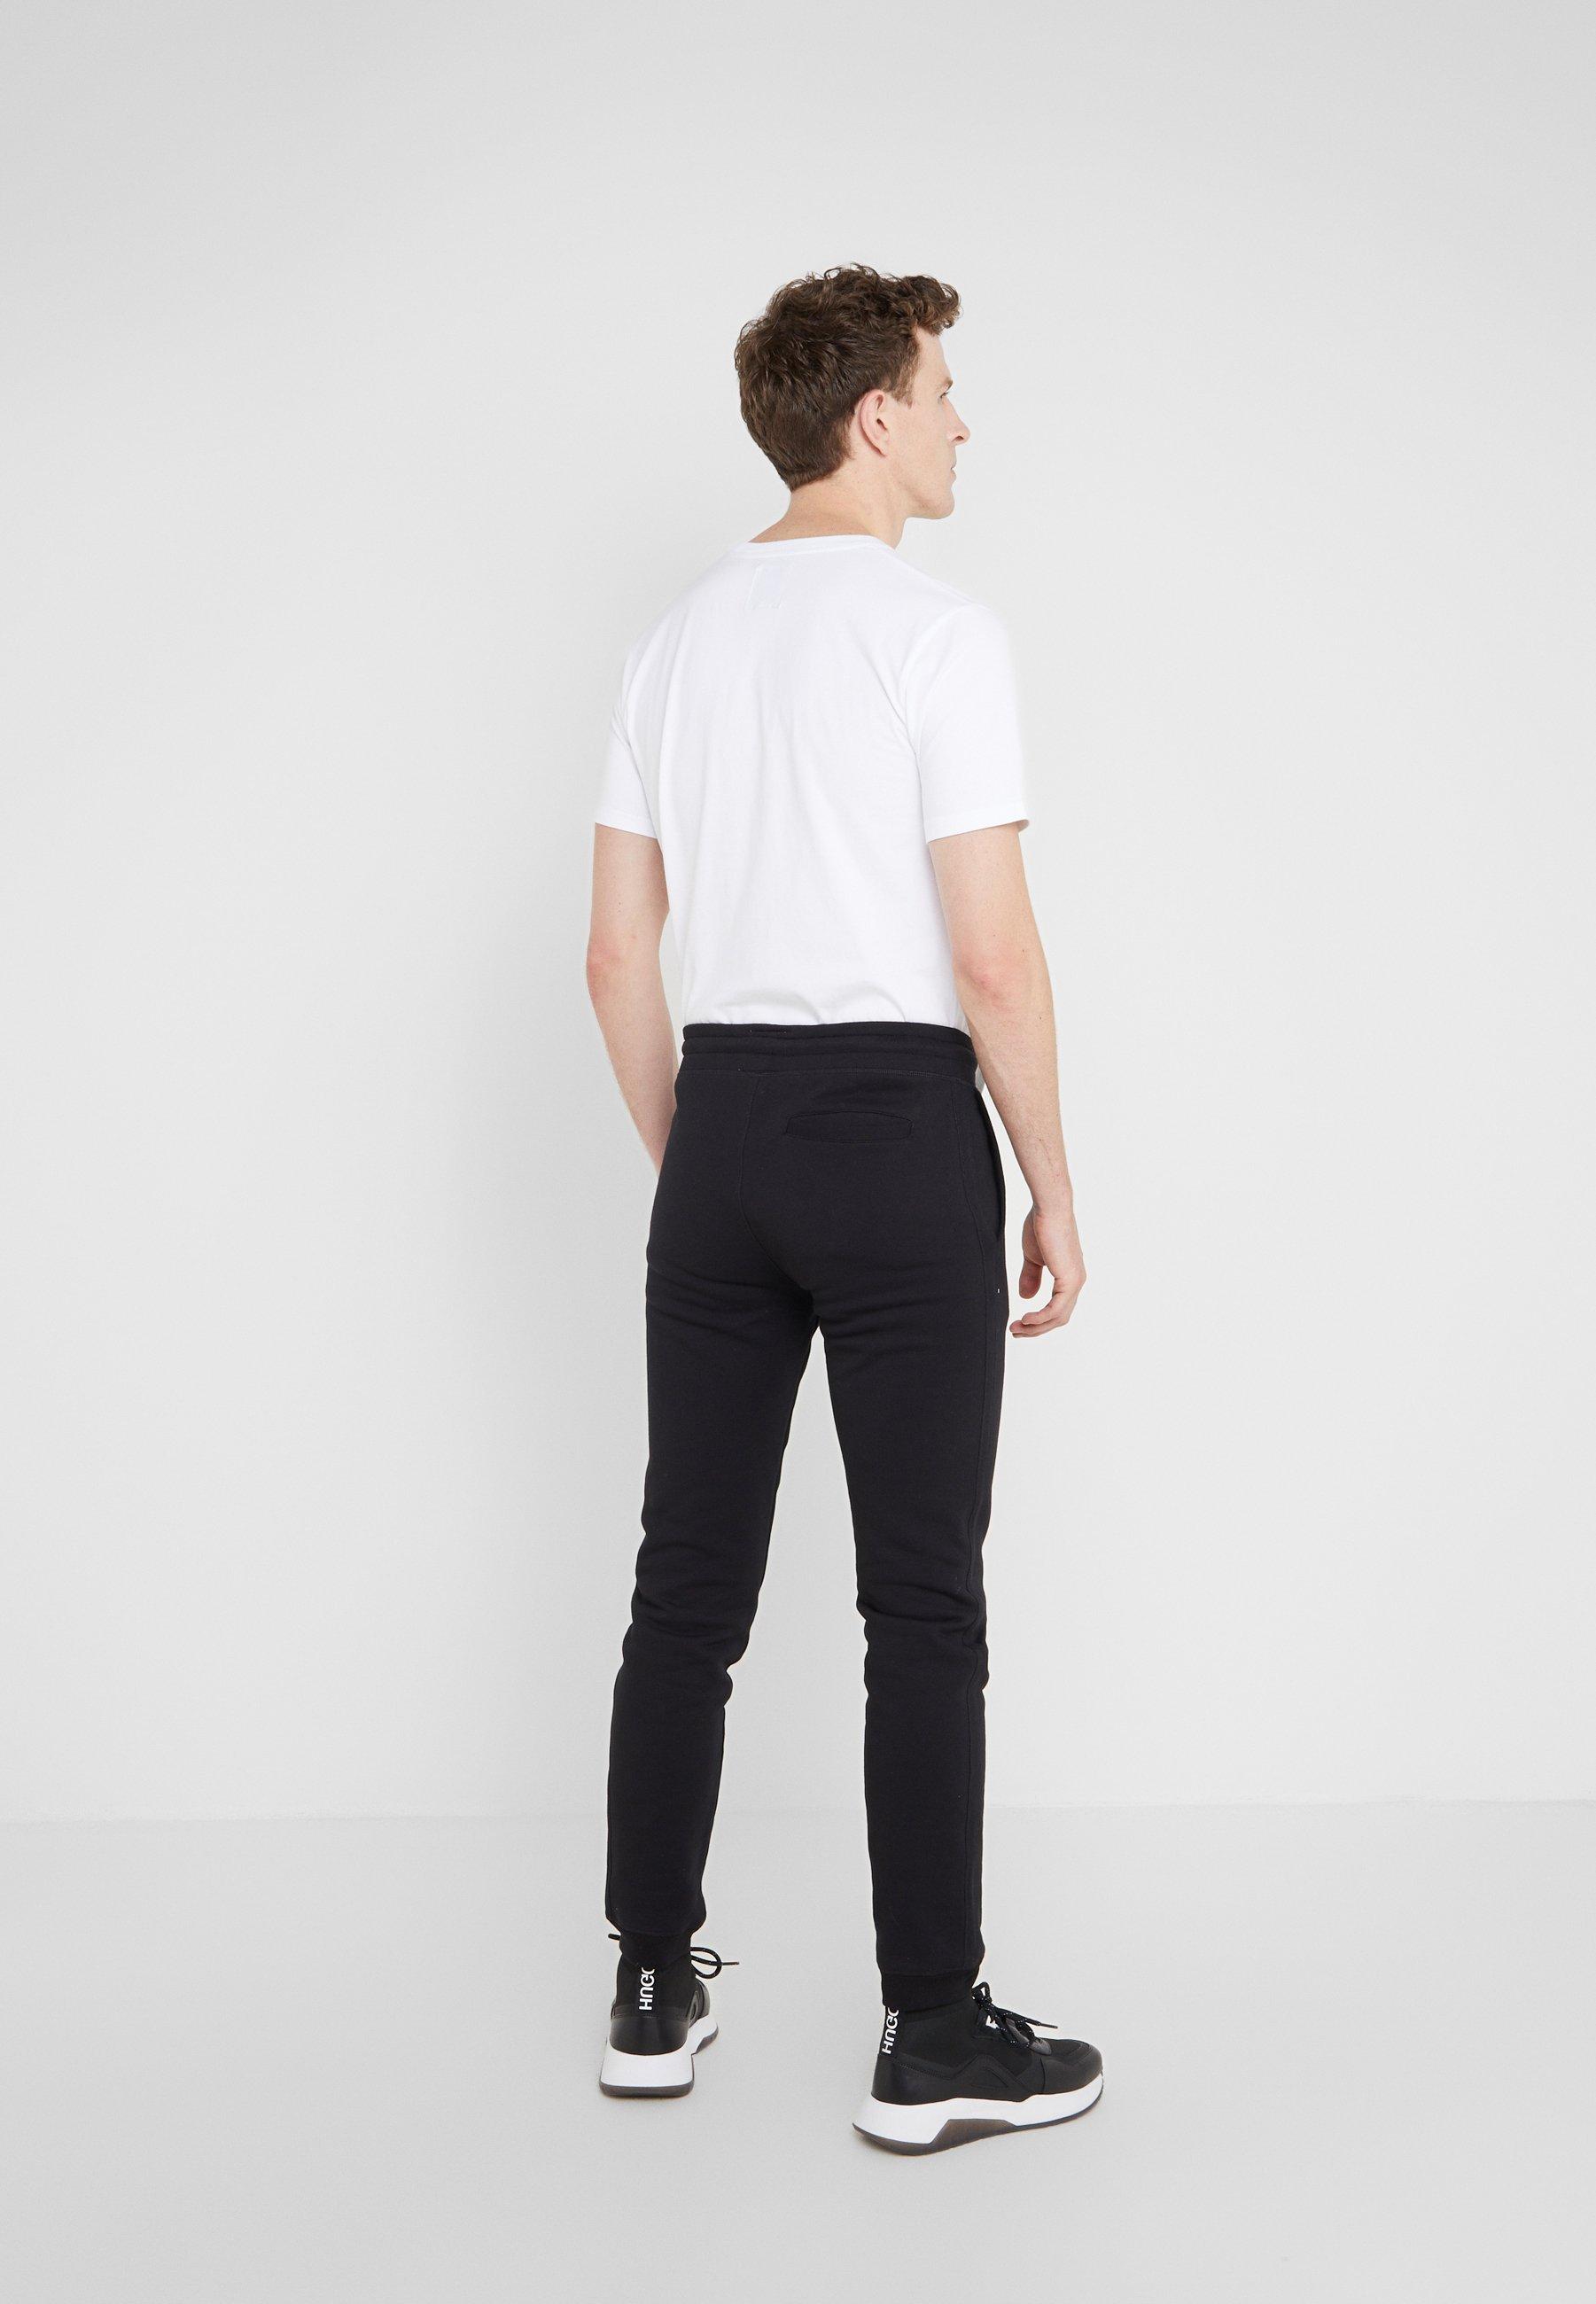 Man Black De BoomPantalon Survêtement Bricktown Pants Small OkiXuZP